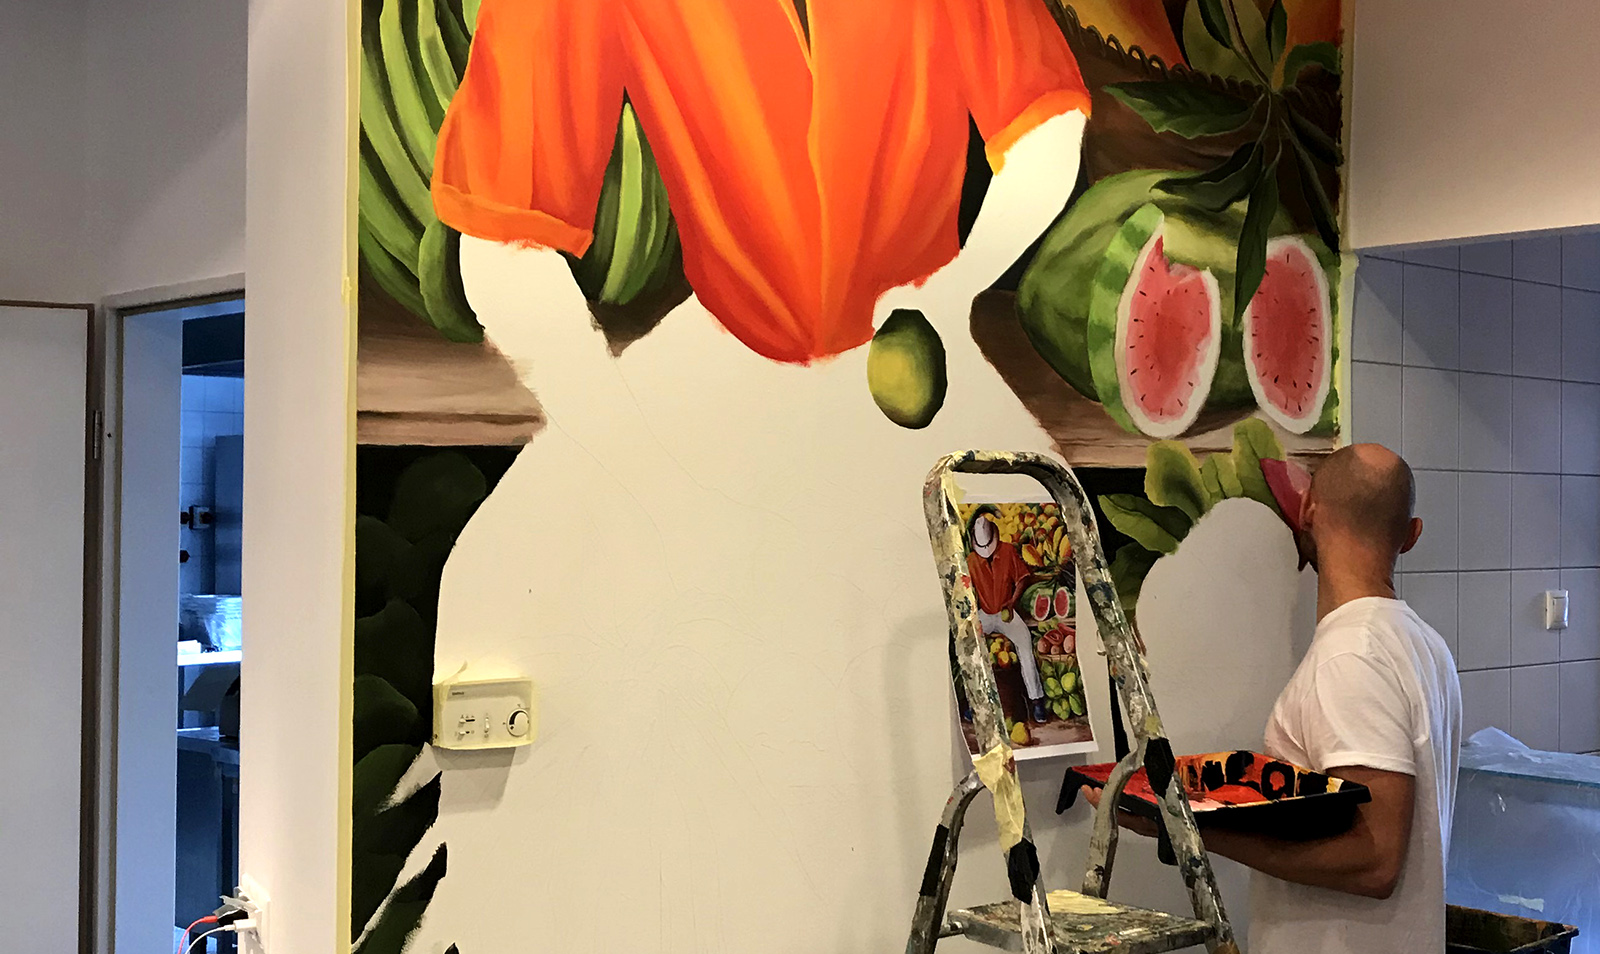 éttermi dekor - neopaint works